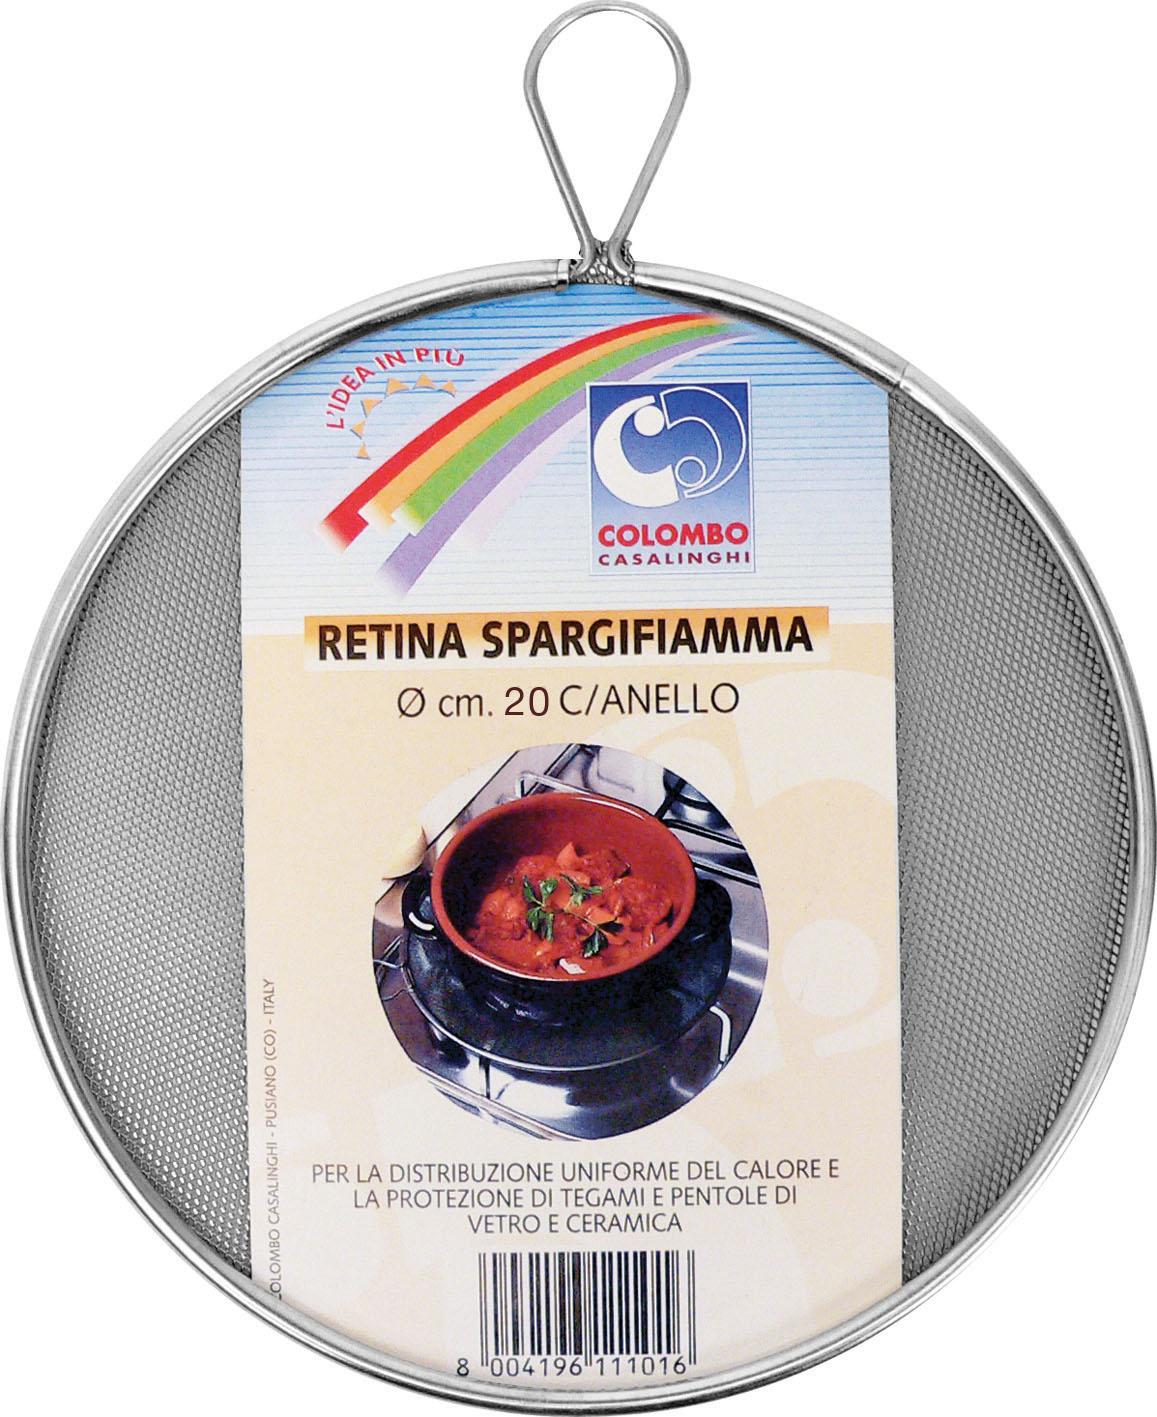 RETINA SPARGIFIAM  C AN  CM 20